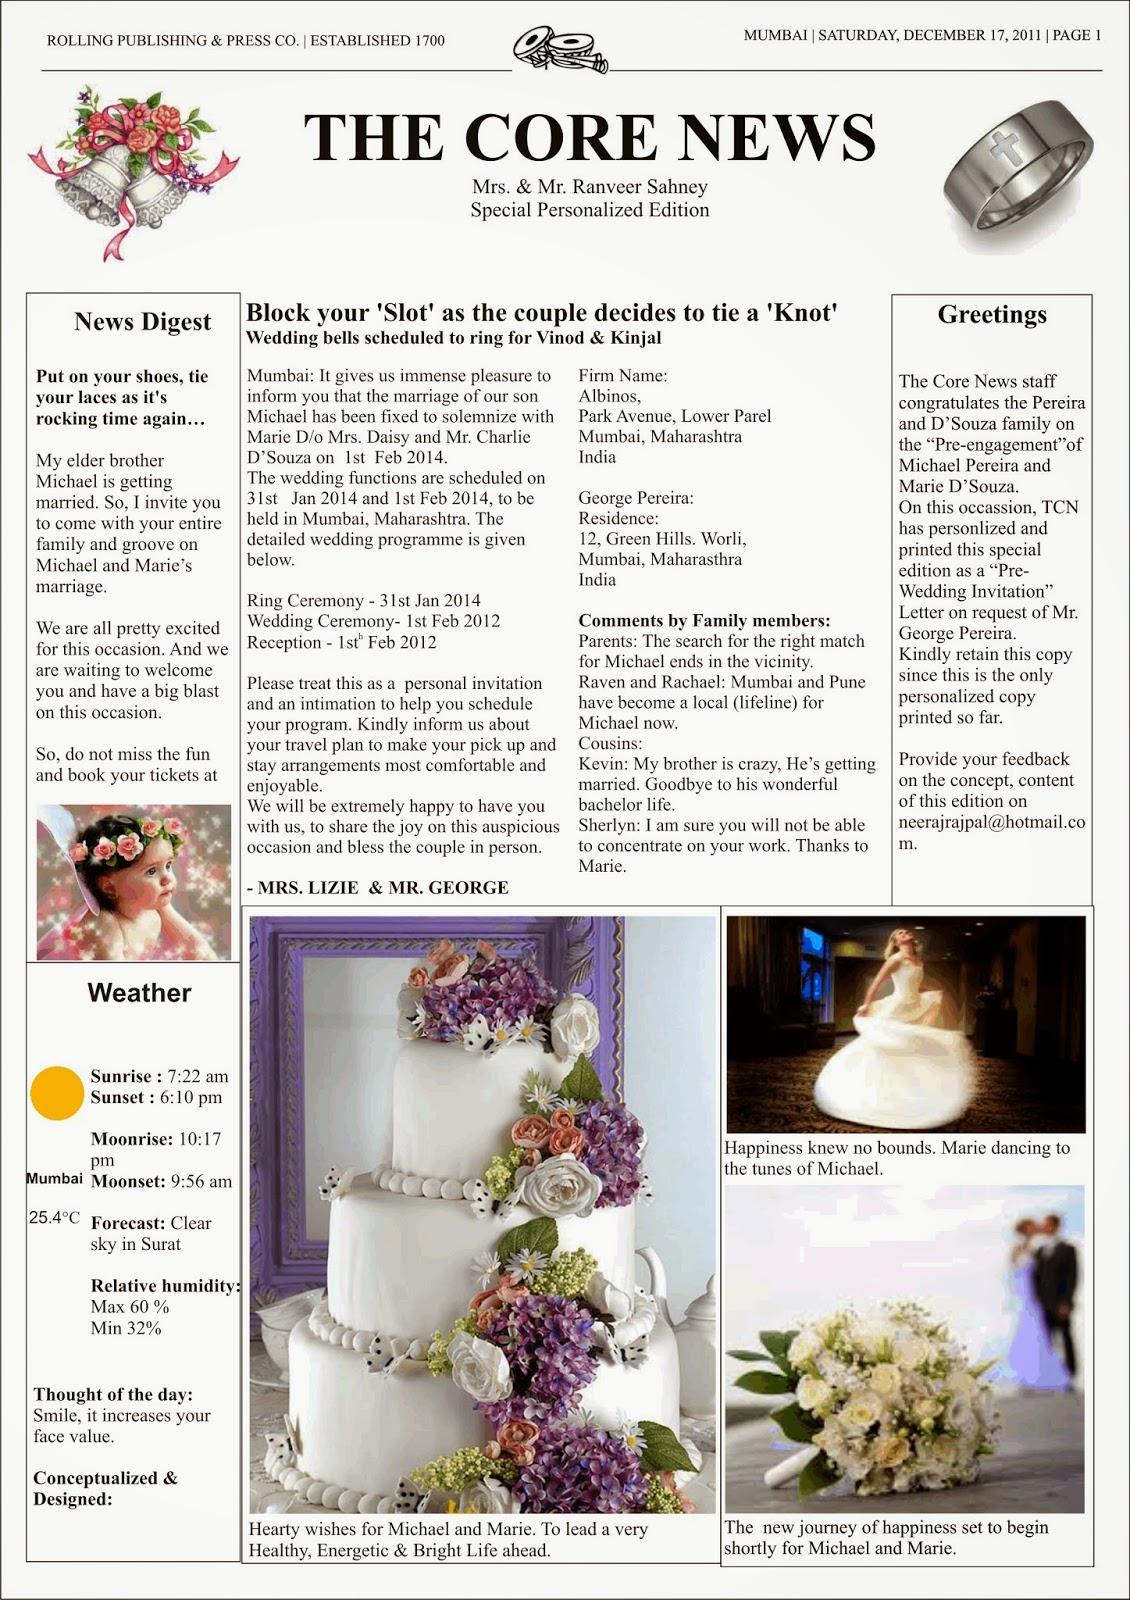 Fish Your Idea - { creative ideas }: Wedding Invitation Letter - A ...